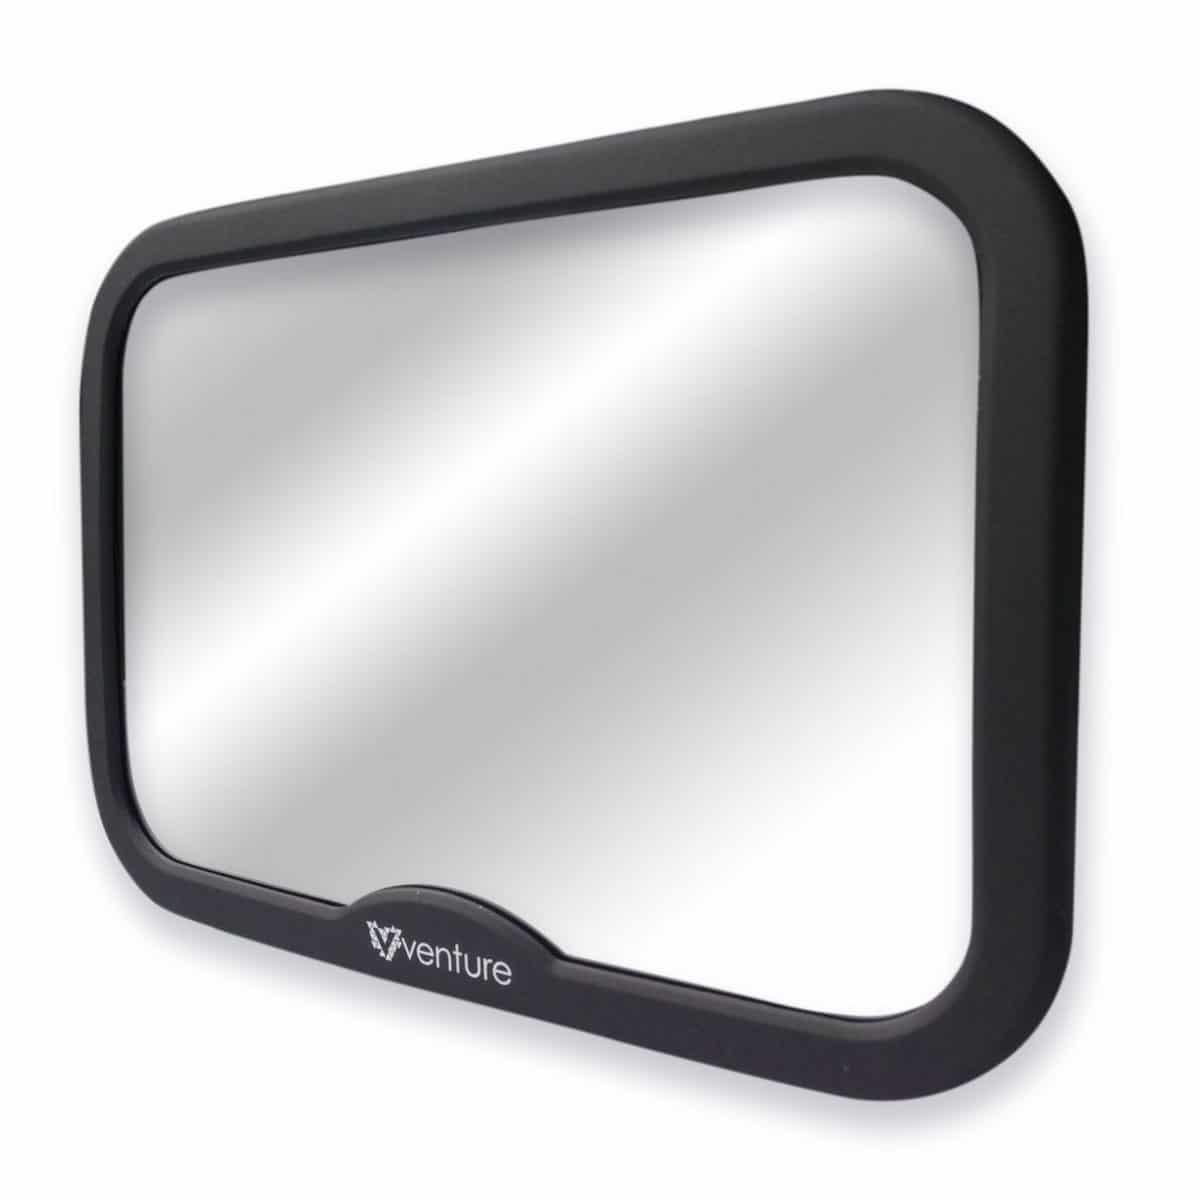 Venture Acti-Vue Car Mirror in black